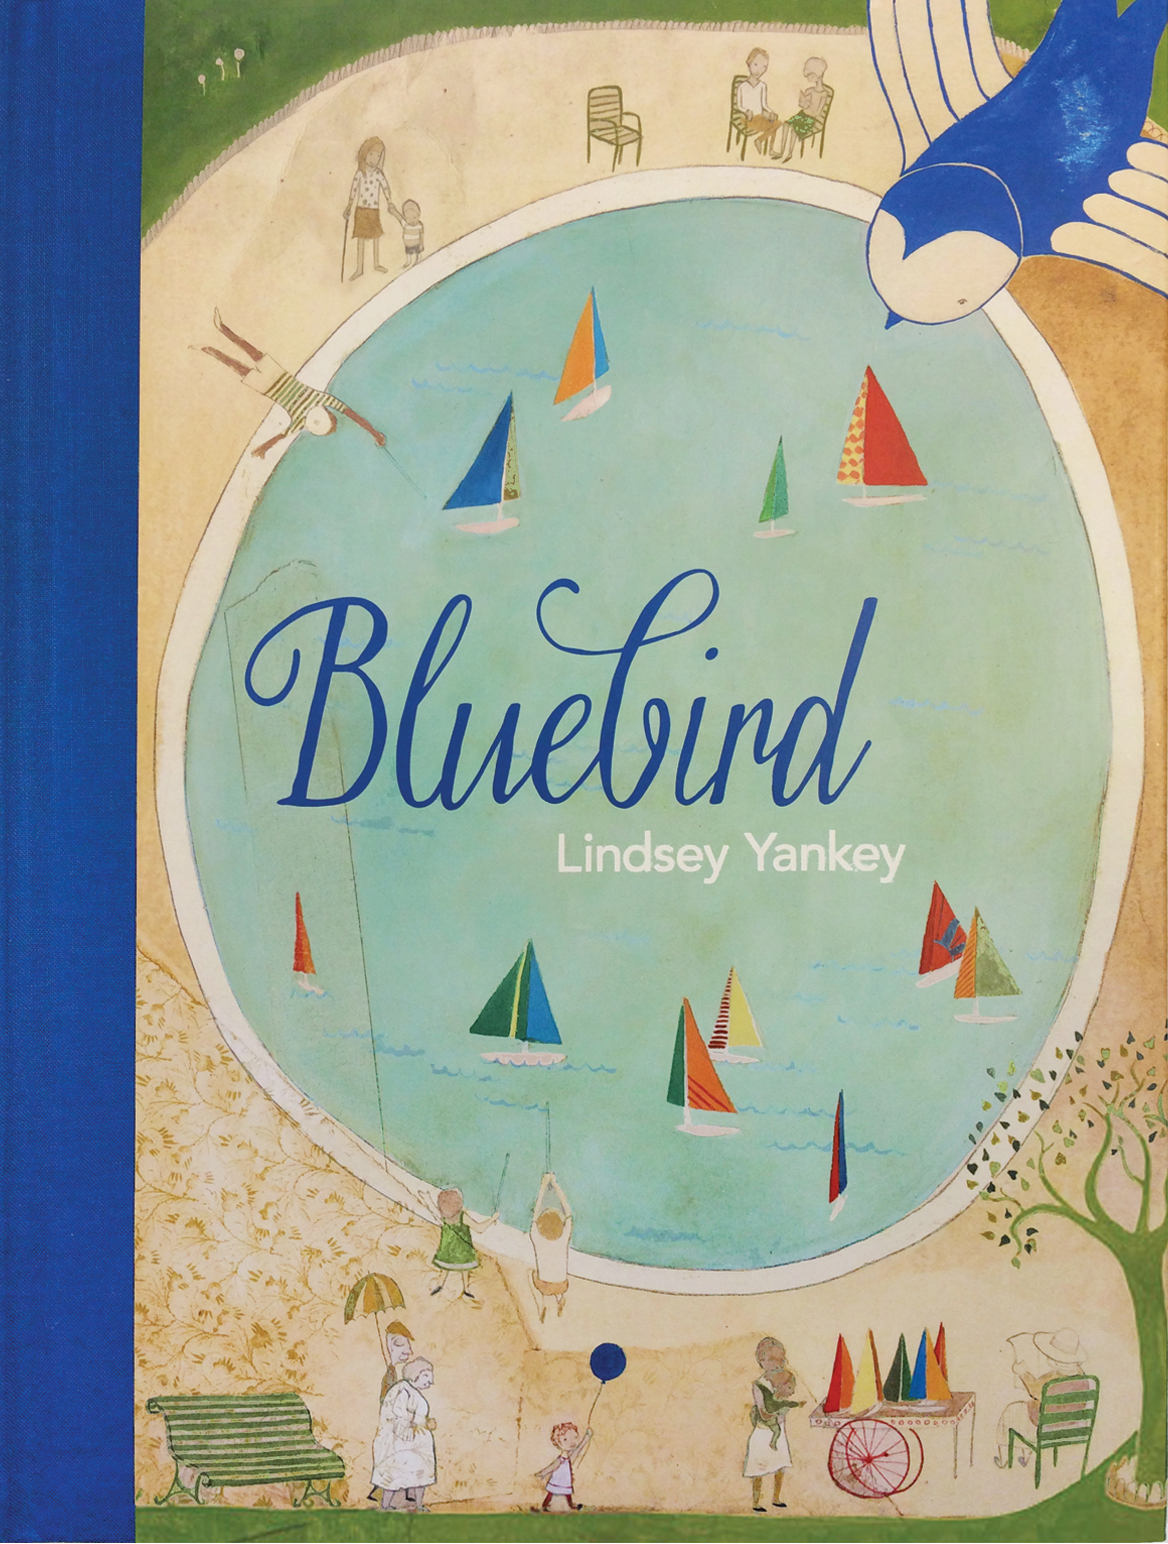 Bluebird / Lindsey Yankey